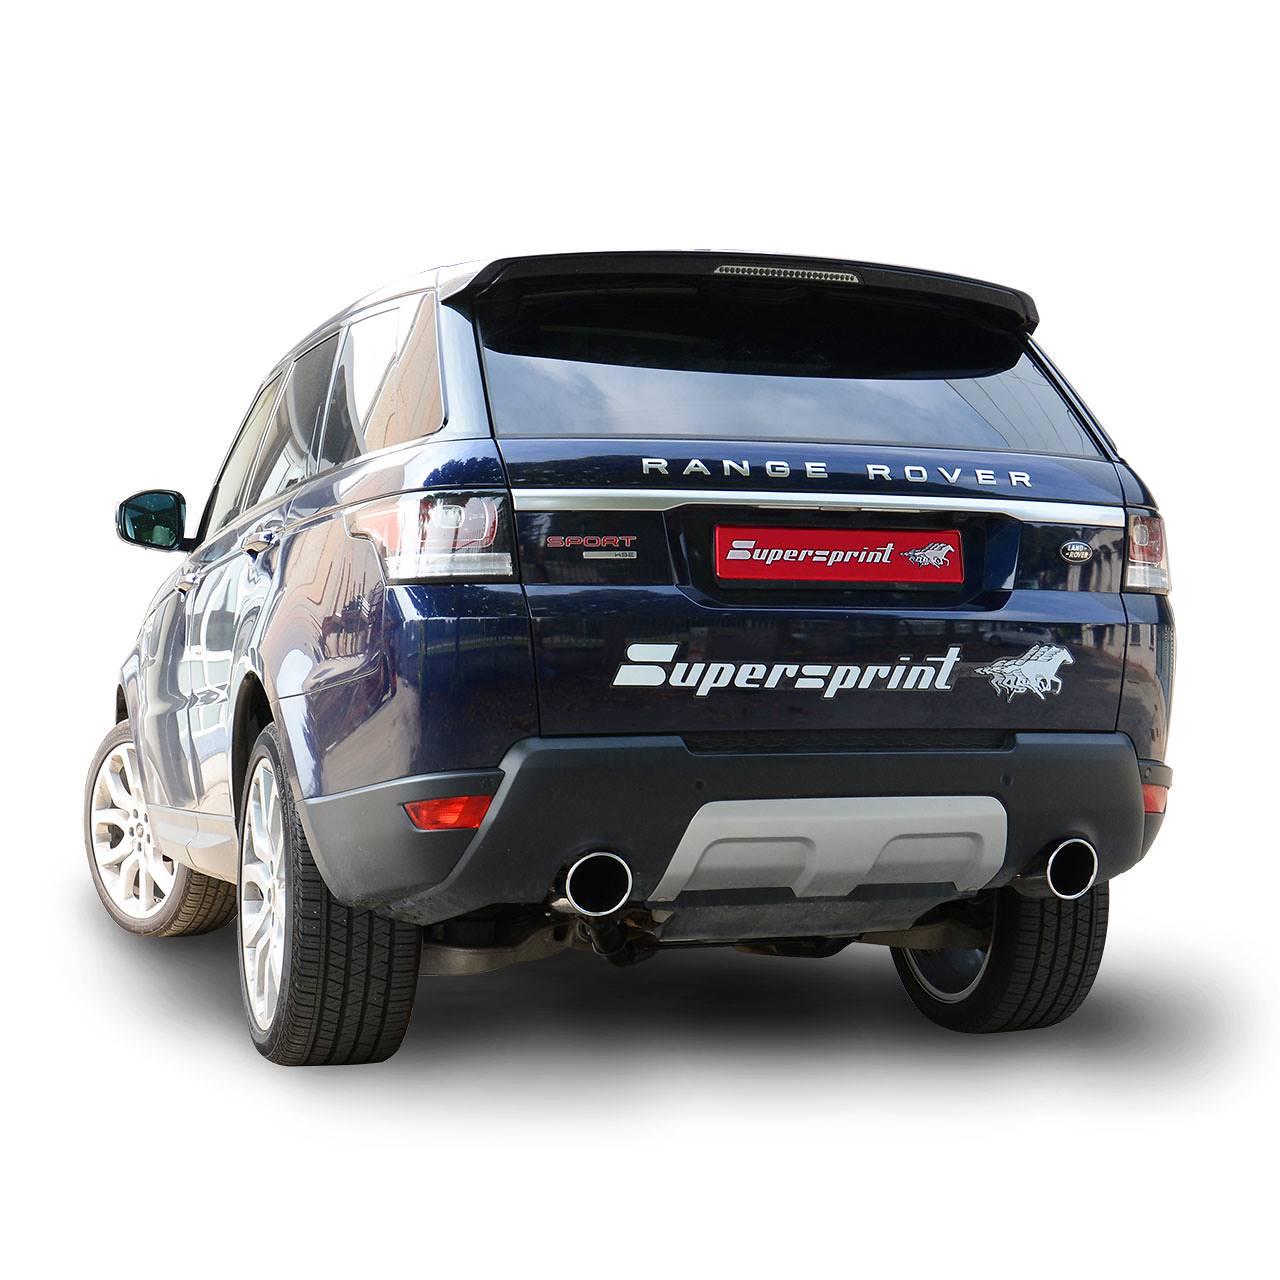 RANGE ROVER SPORT 4.4 SD V8 (339 Hp) 2017 ->, Land Rover